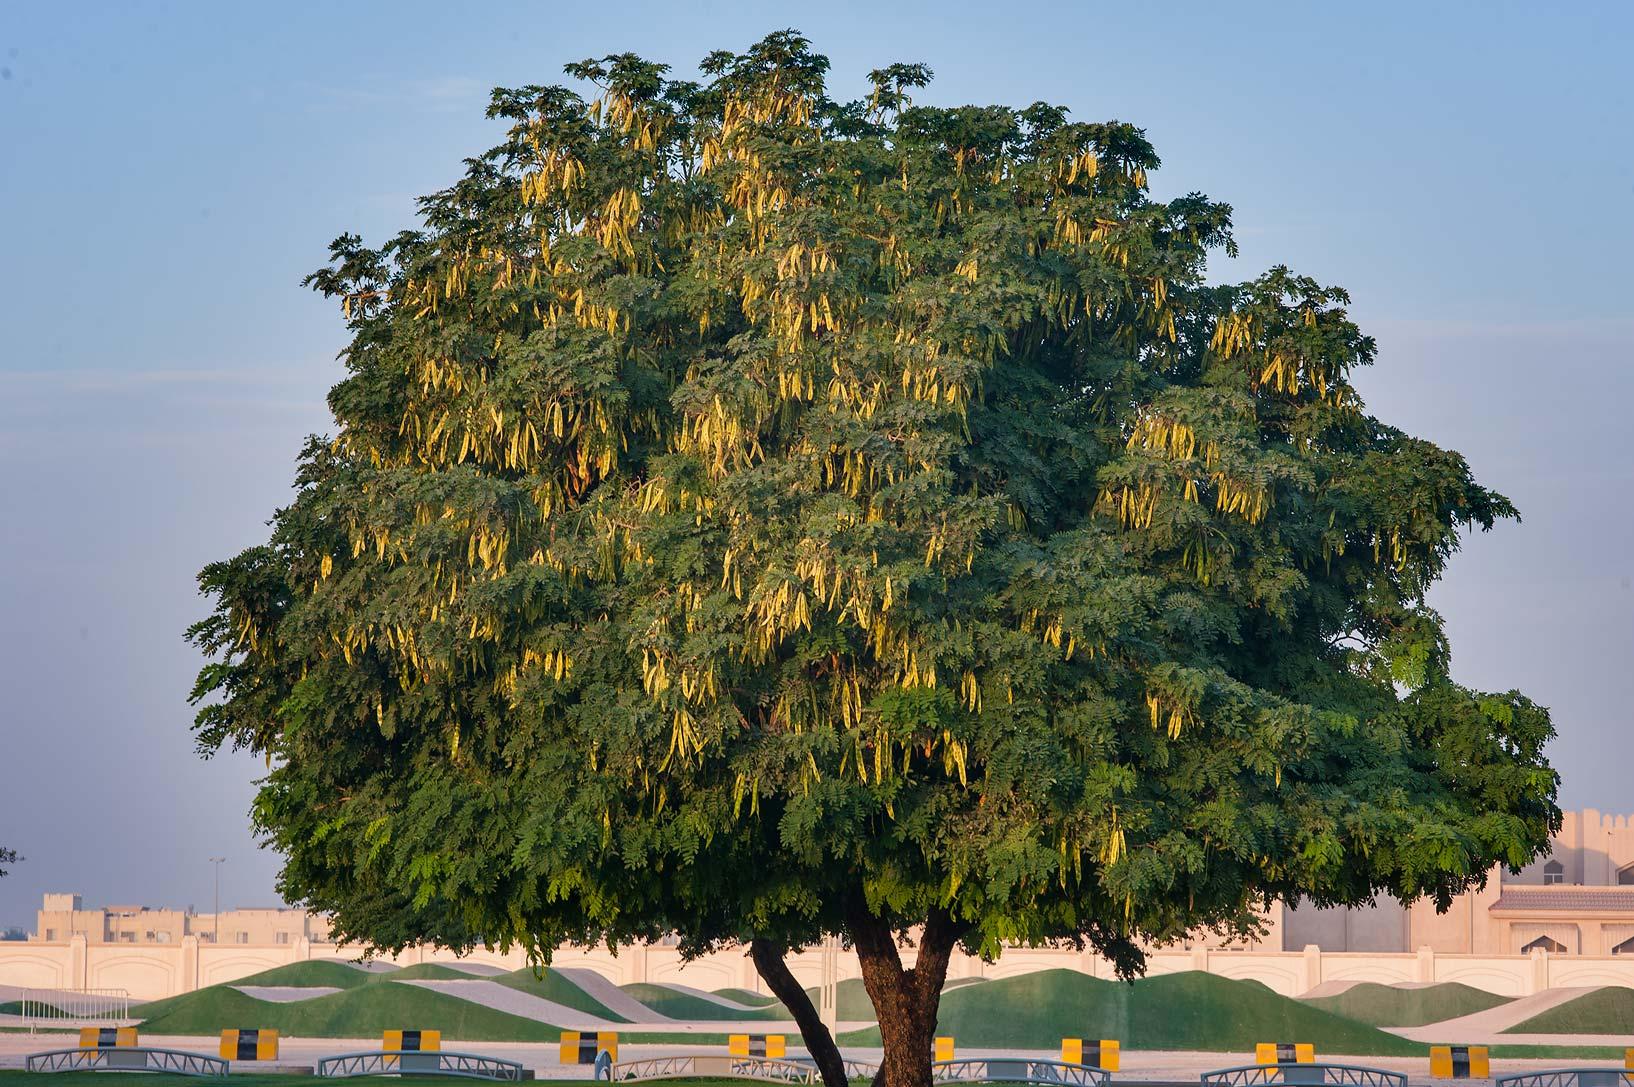 Photo 1504-13: Albizia Lebbeck Tree In Aspire Park. Doha ...